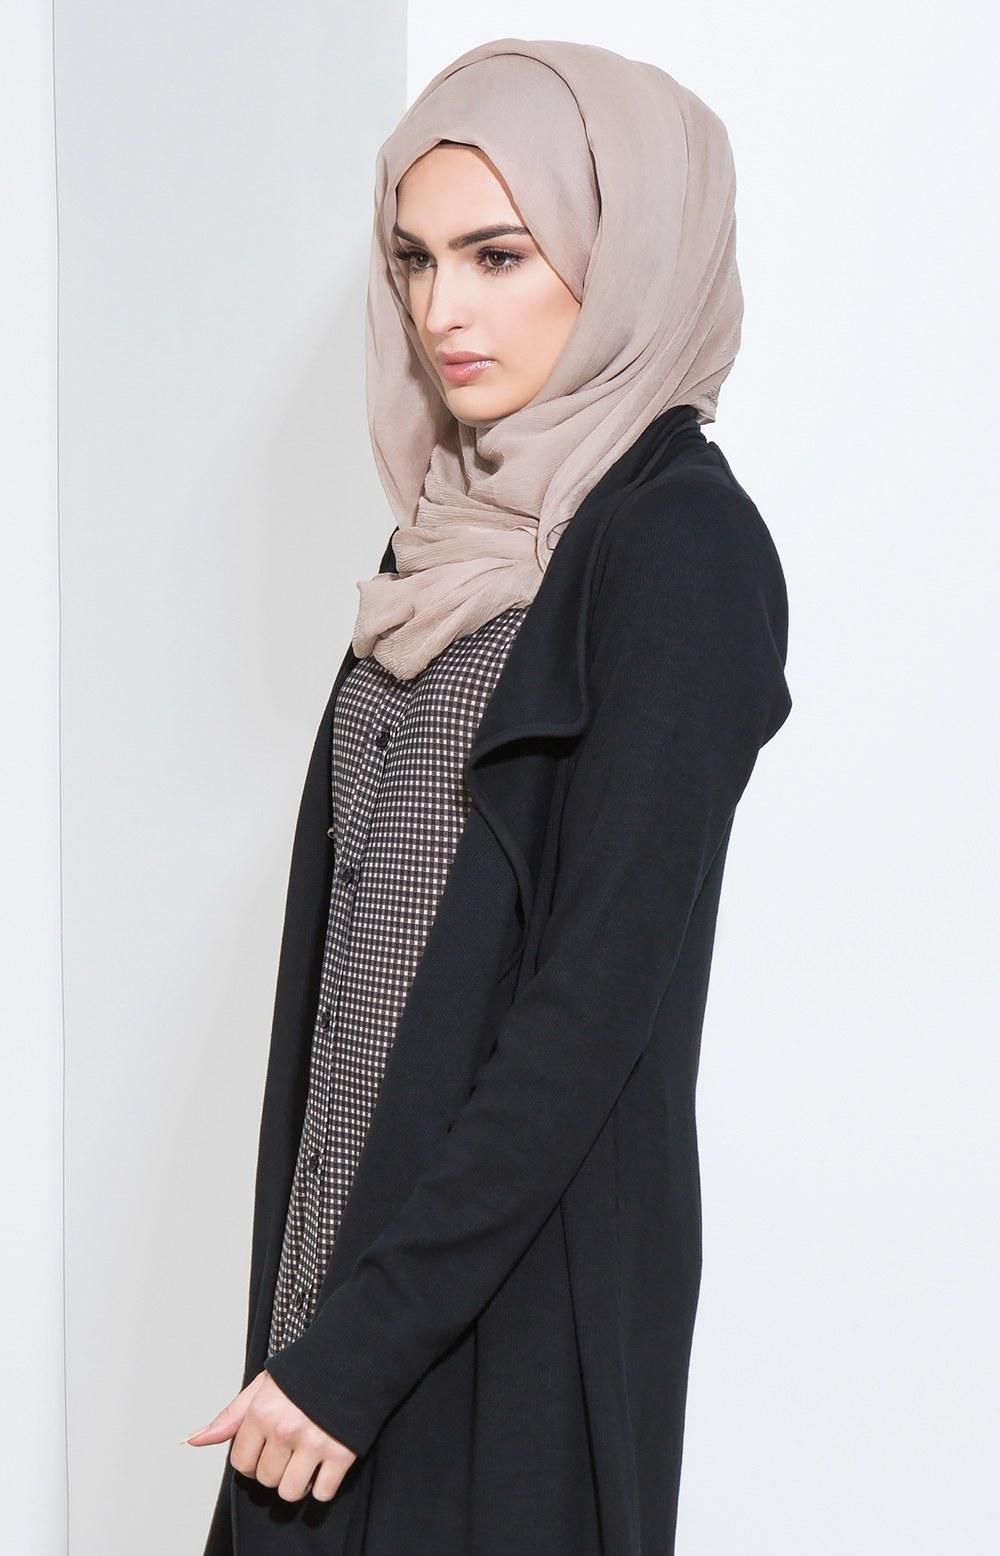 Design Baju Lebaran 2017 Drdp 25 Trend Model Baju Muslim Lebaran 2018 Simple & Modis